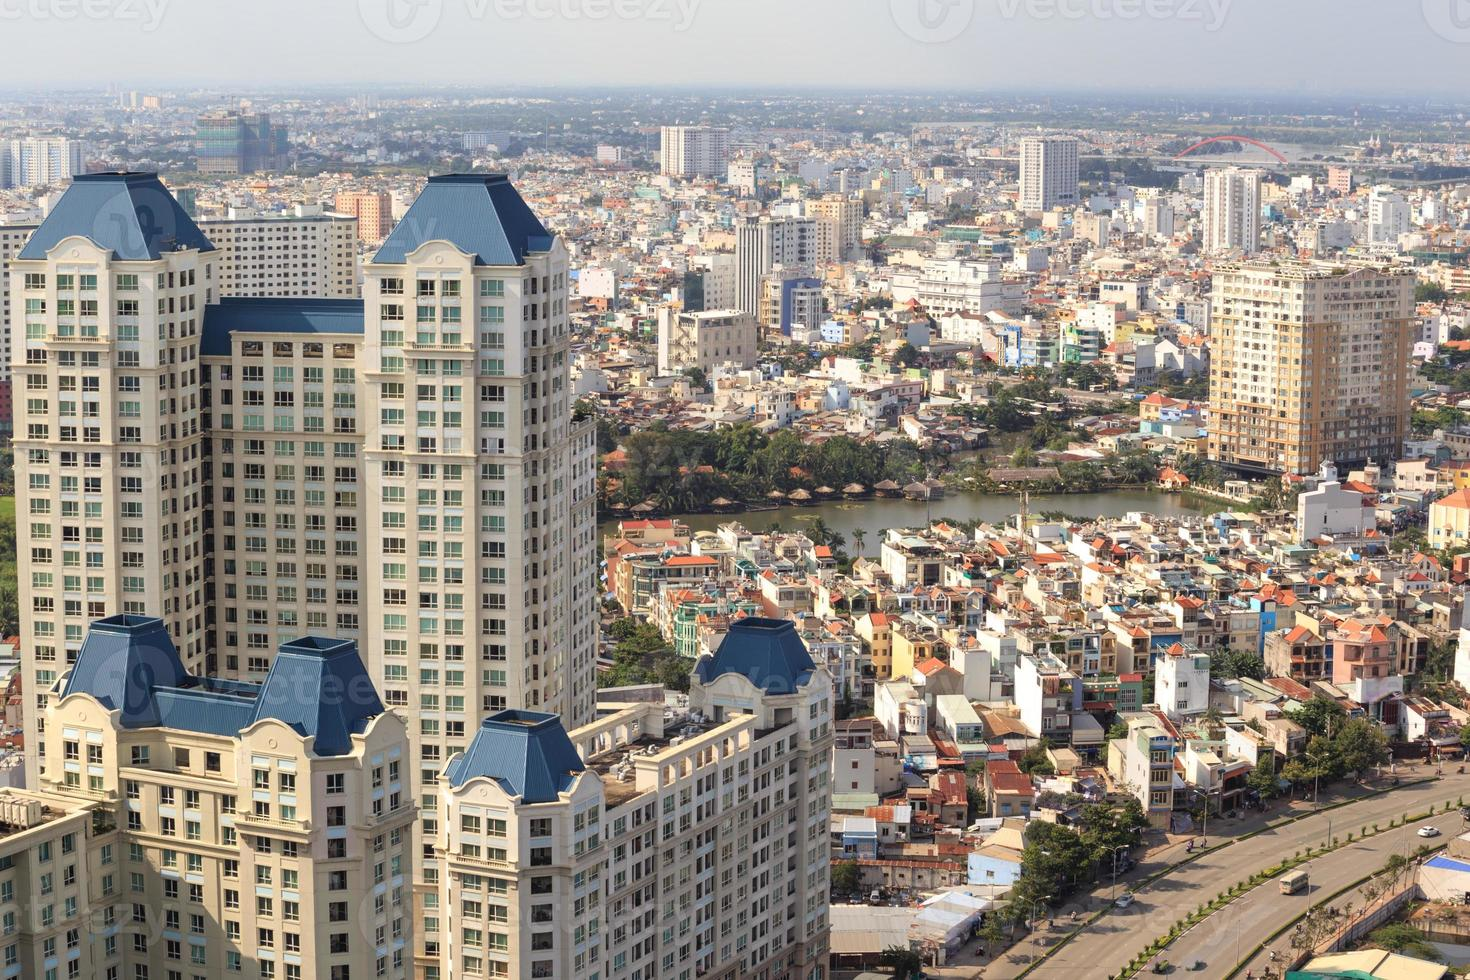 panorama de ho chi minh ville, saigon vietnam photo